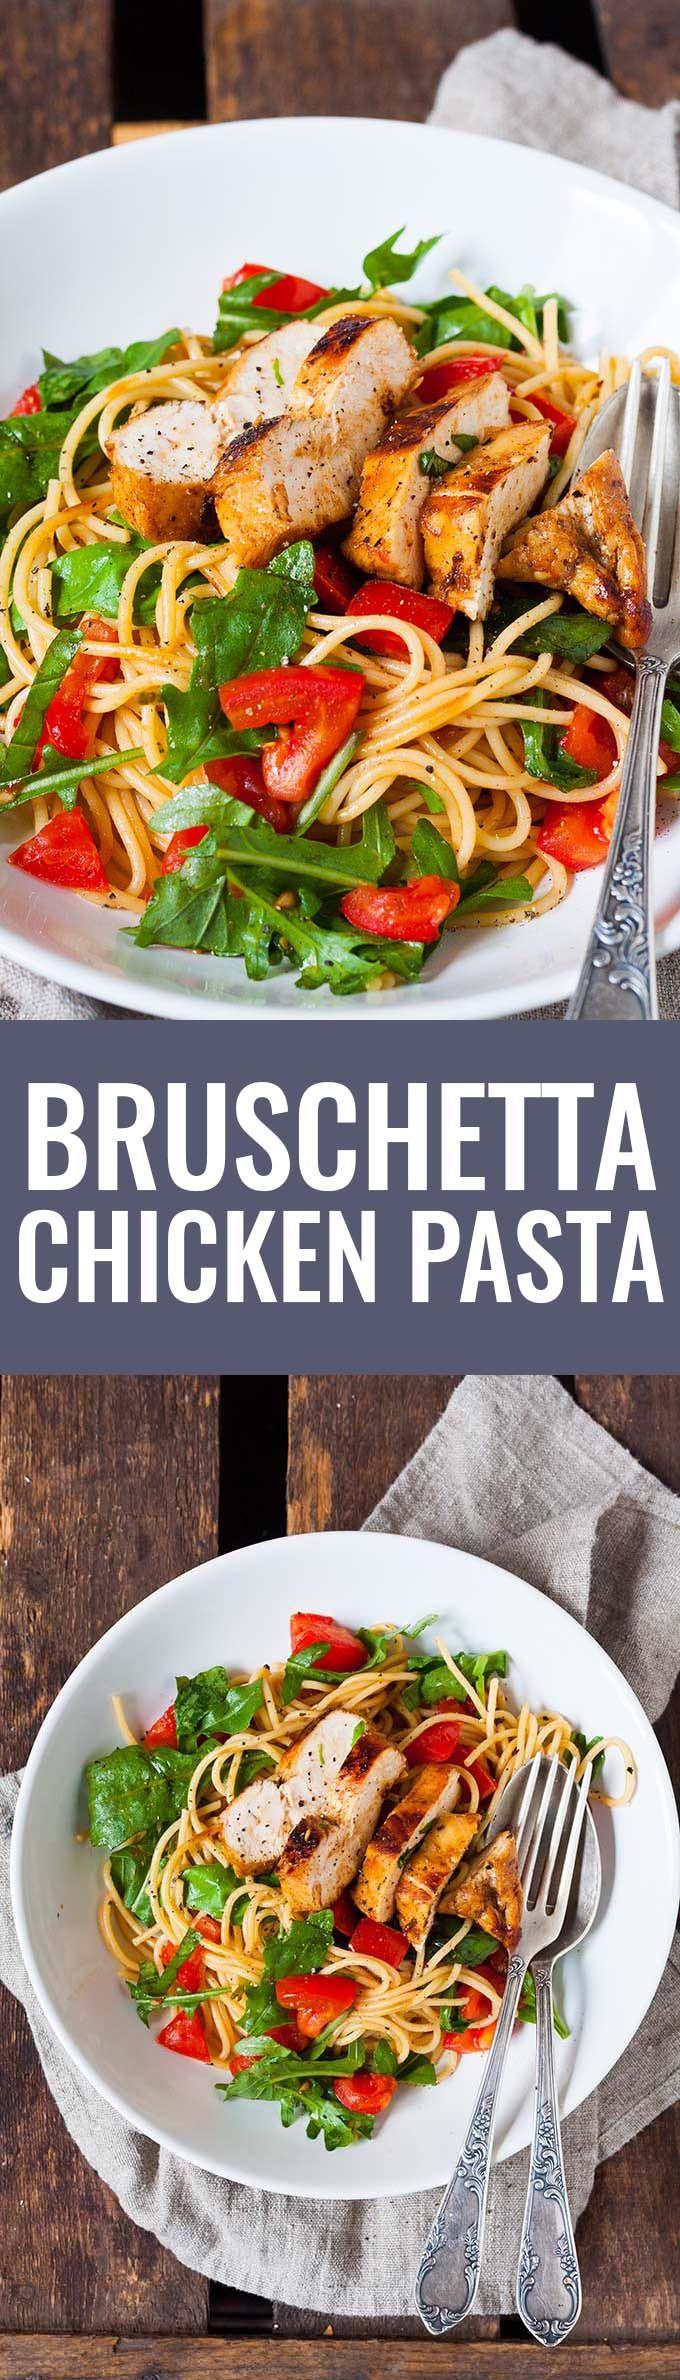 Bruschetta Chicken Pasta - Kochkarussell.com